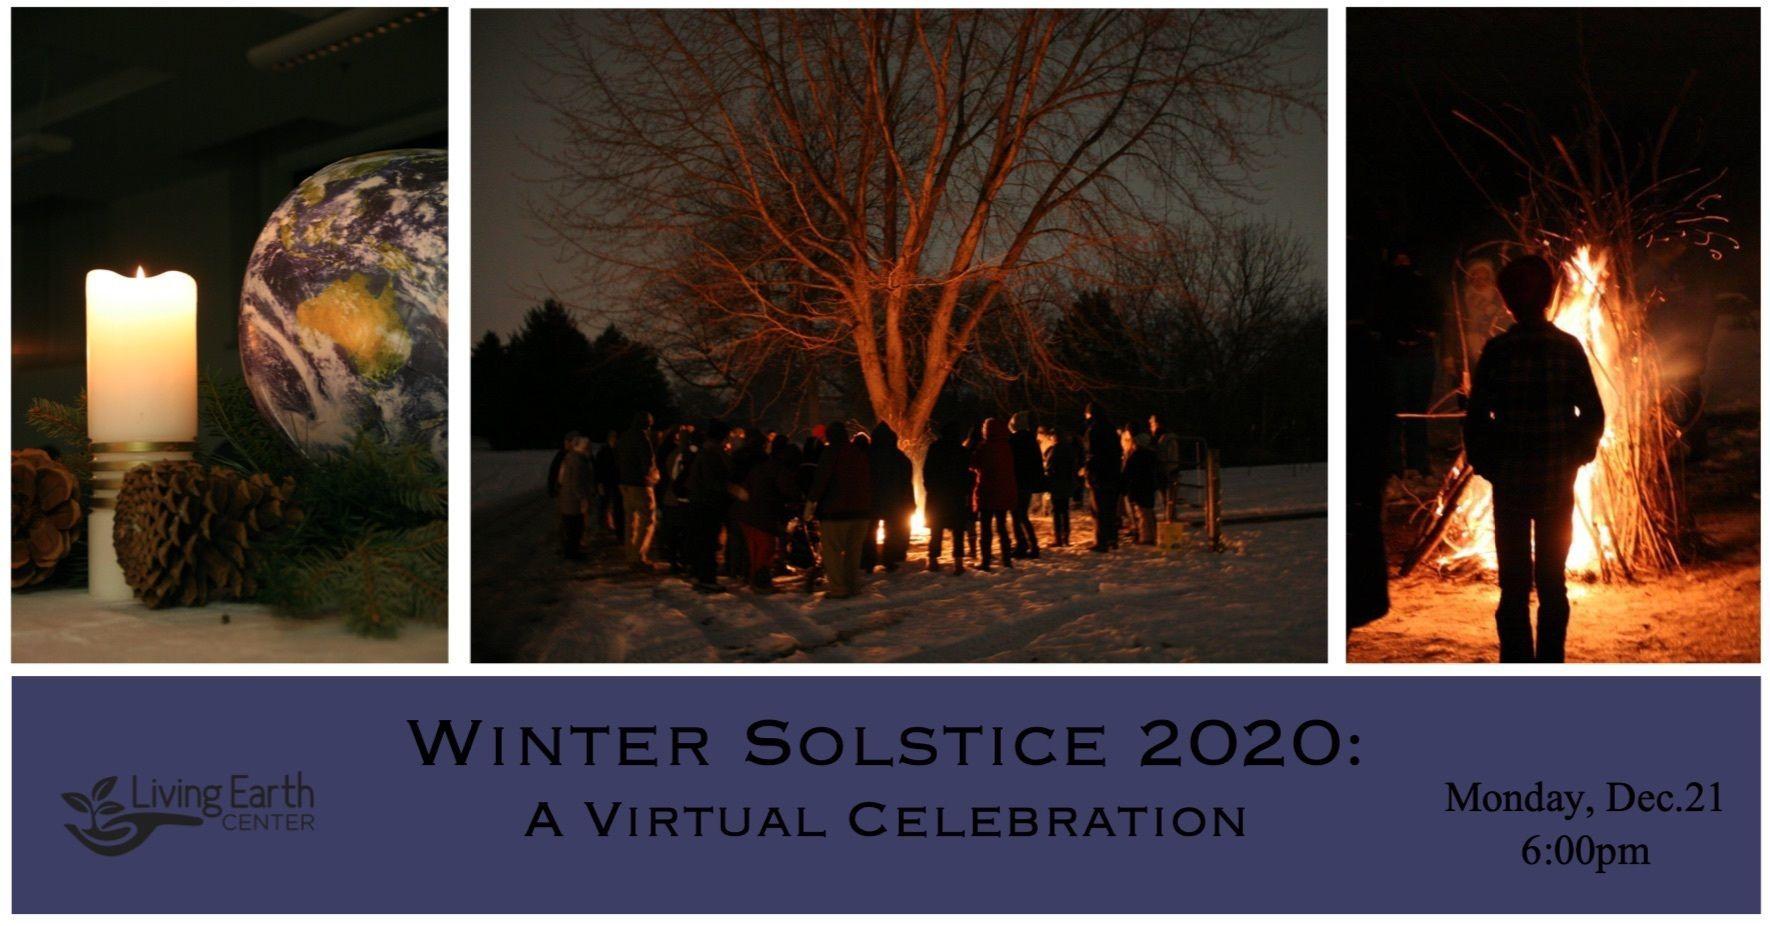 Virtual Winter Solstice Celebration